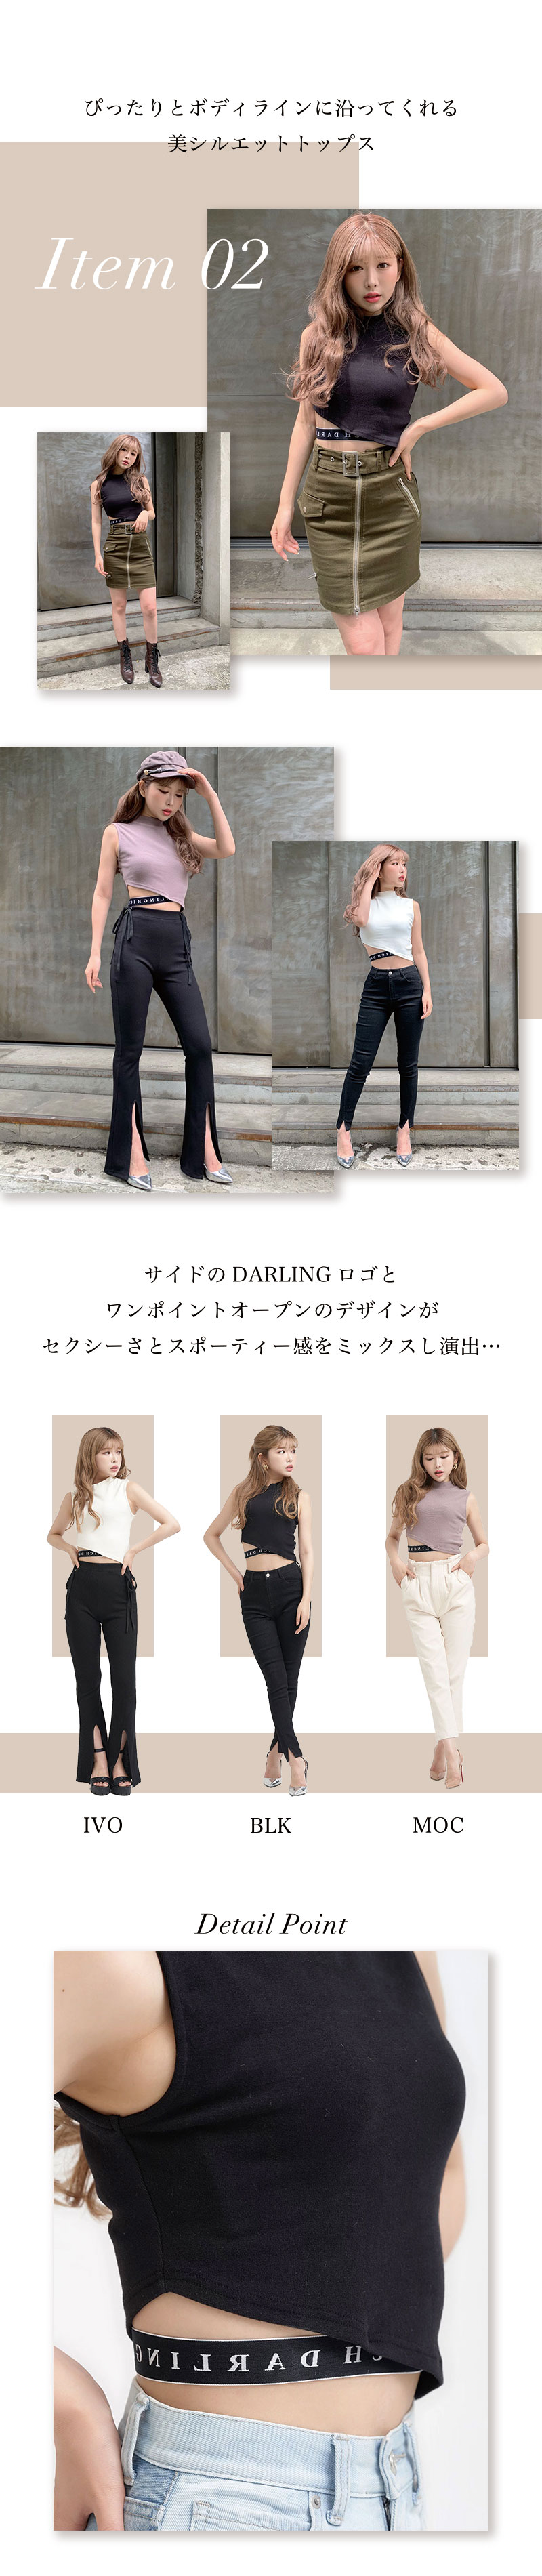 19SS DARLING SERIES新作特集2